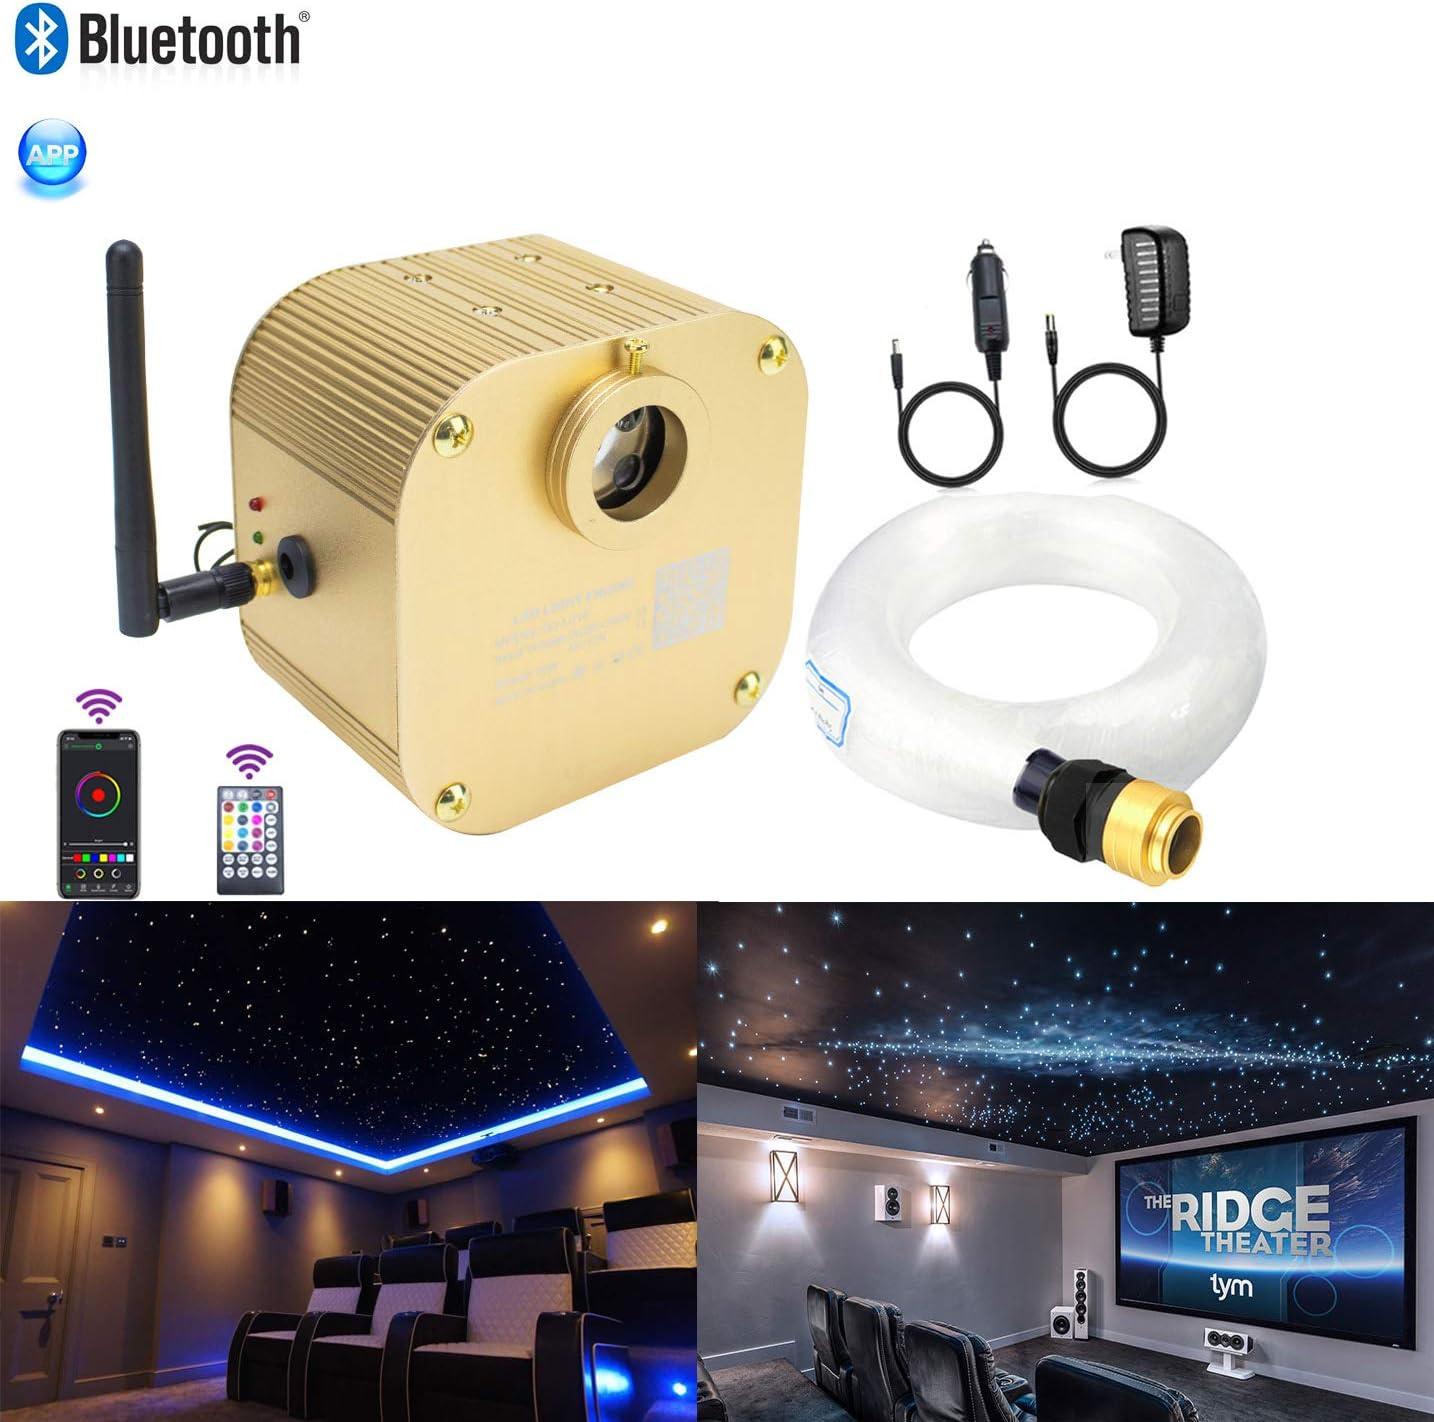 AZIMOM Bluetooth/APP Control 16W Twinkle Fiber Optic Lights Star Ceiling Lighting Kits Remote RGBW Music Mode Light Engine Fiber Strands for Home Indoor Car Interior Decoration 550pcs0.03in13.1ft